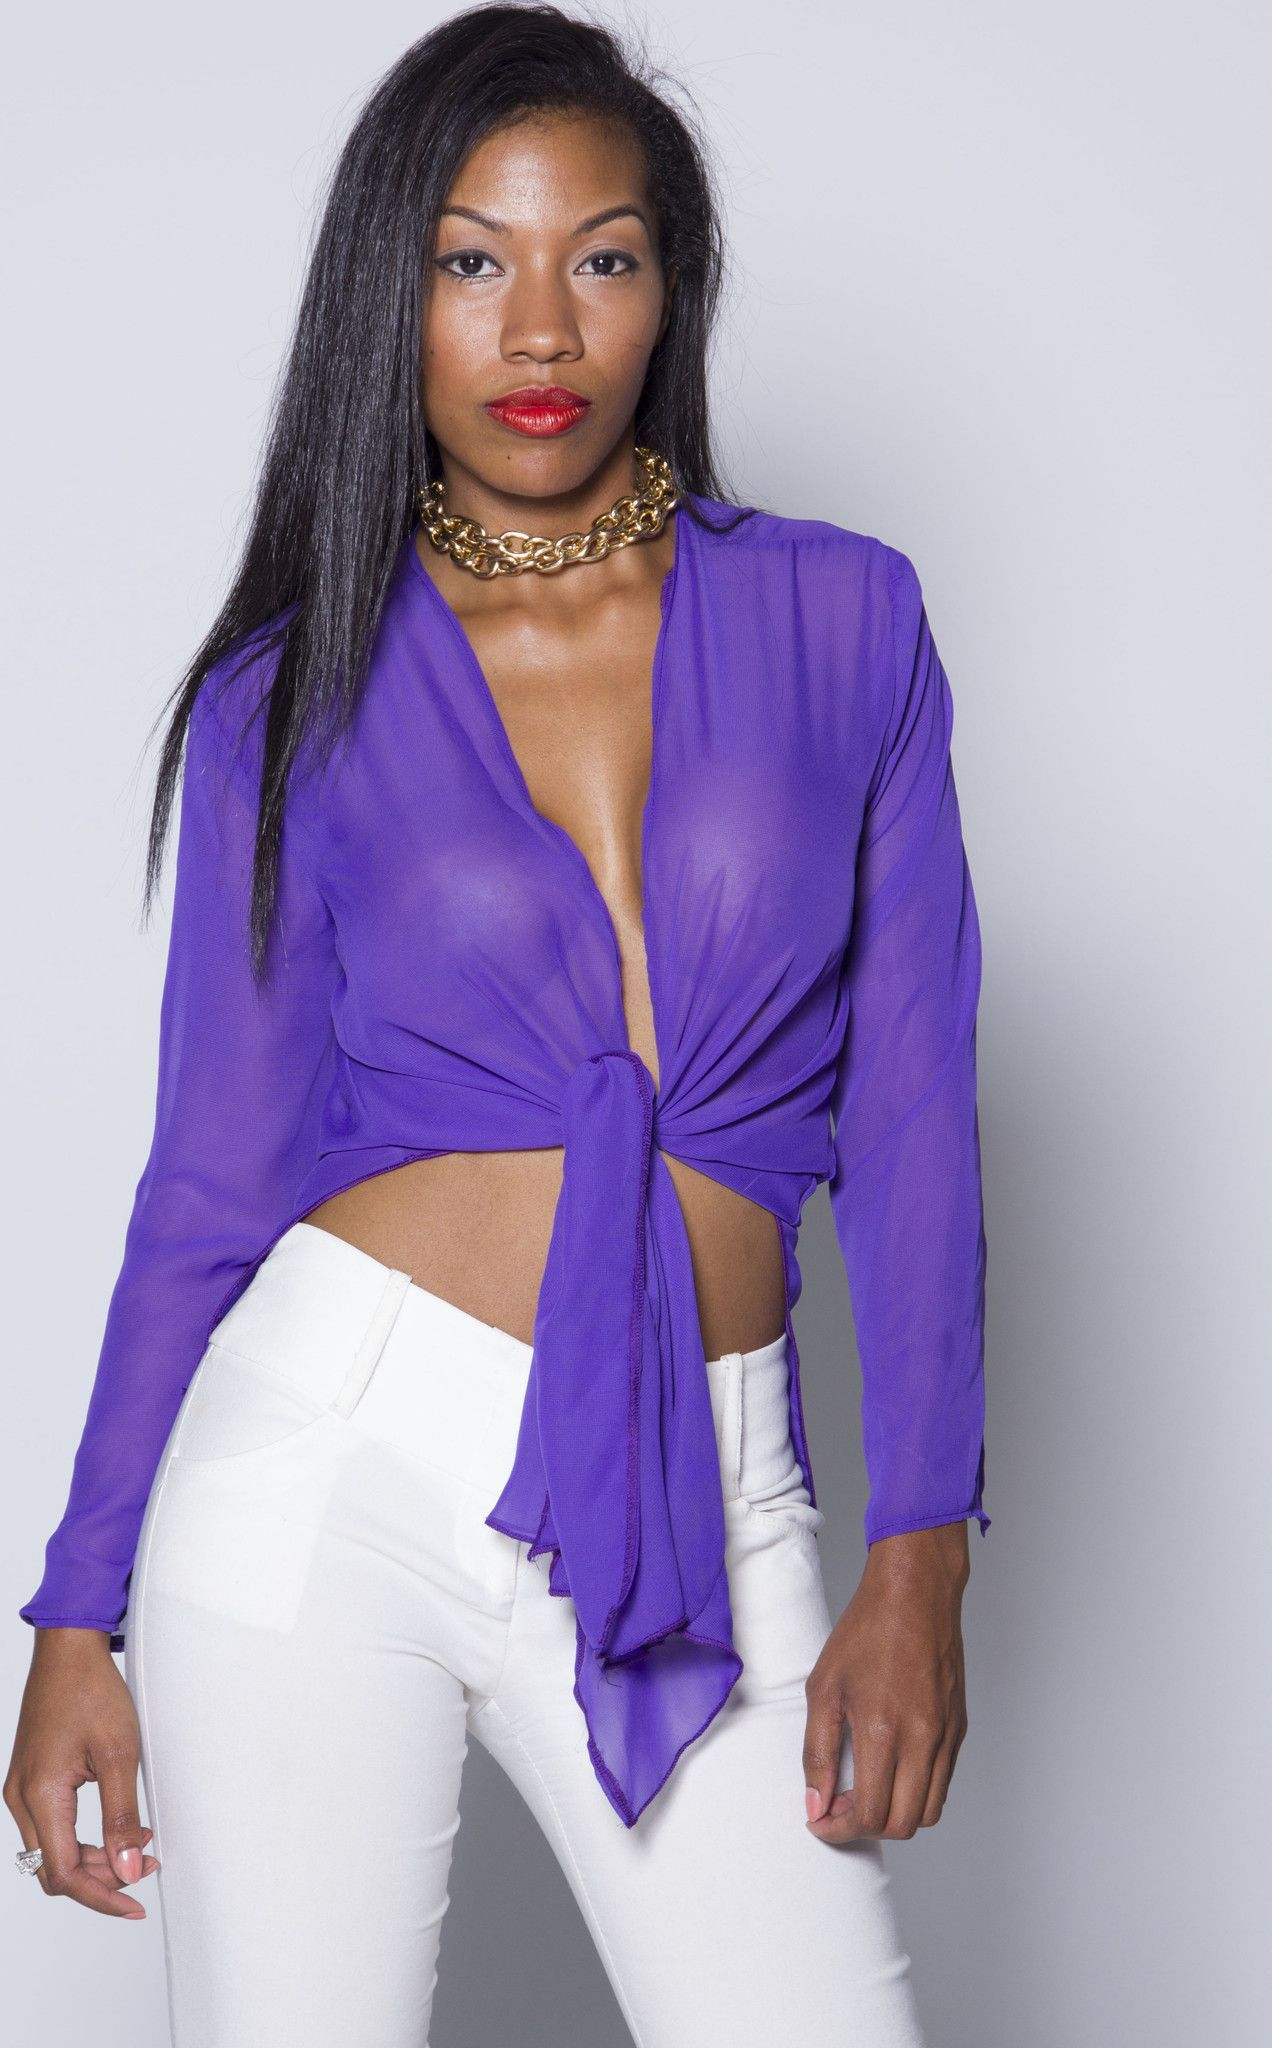 Purple Sheer Iammi Sexy Tie Blouse Small Medium Products